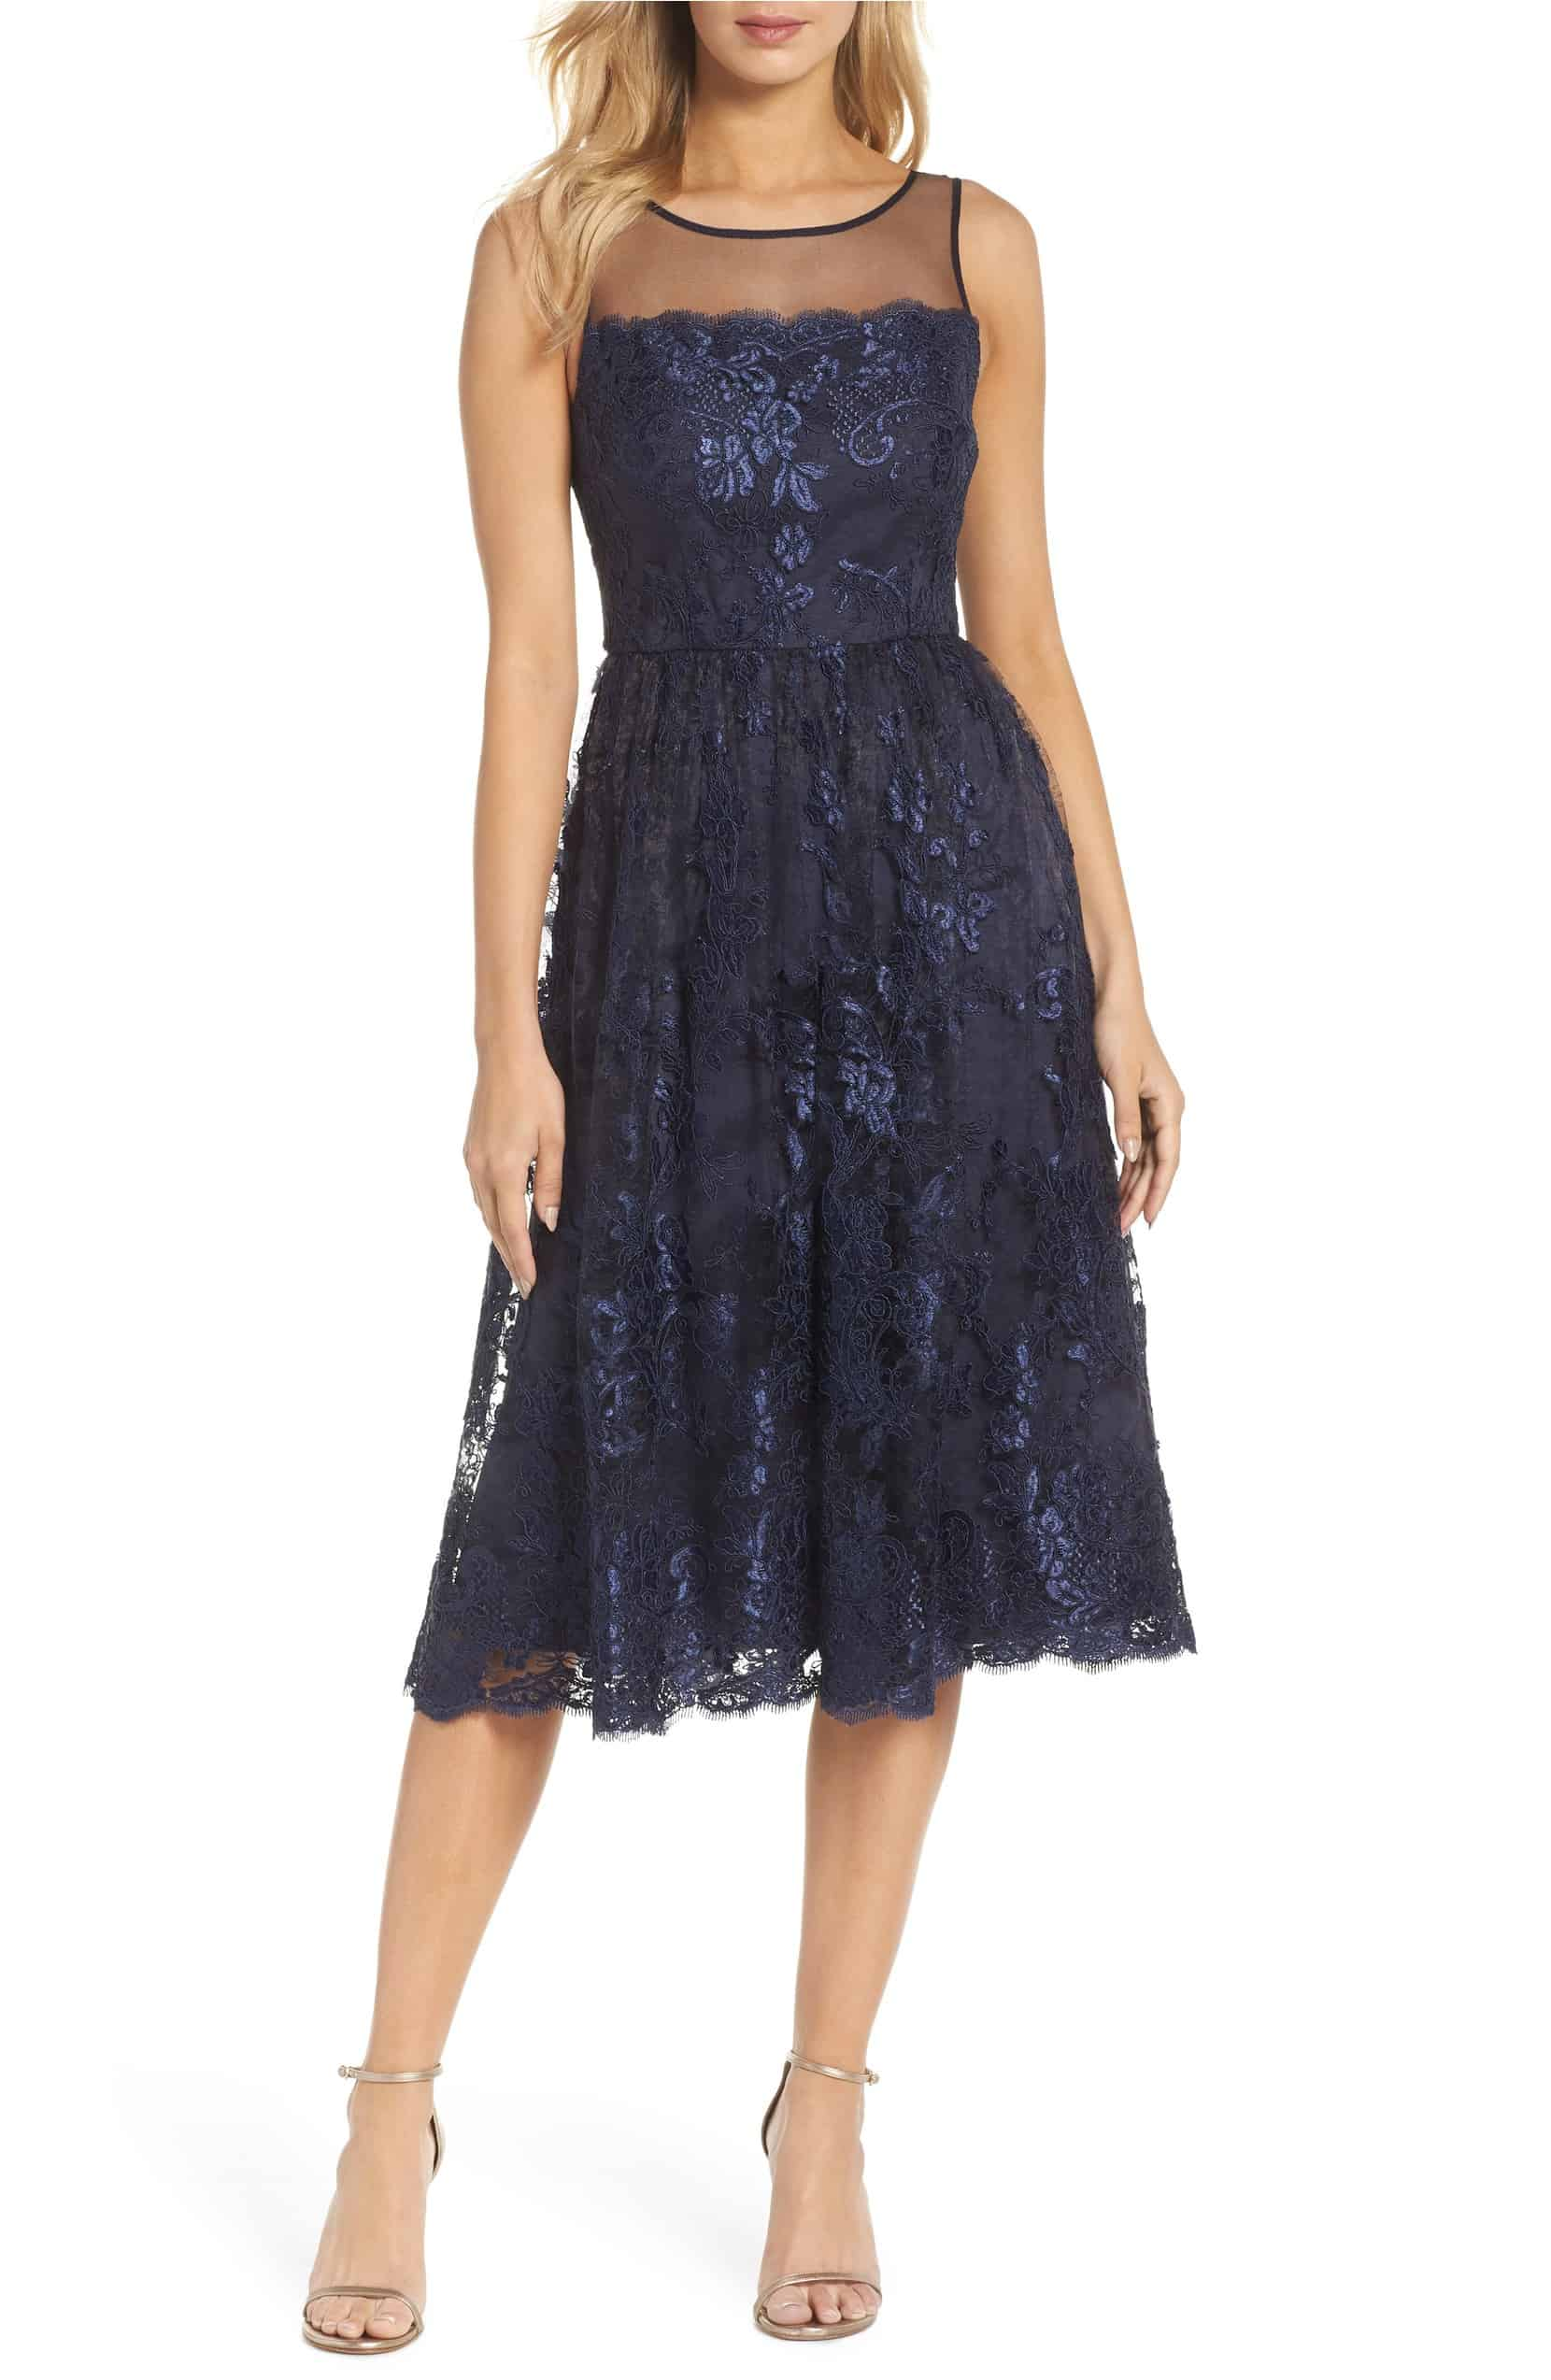 f145bafbce Navy Blue Tea Length Lace Dress with Illusion Neckline for a Wedding ...